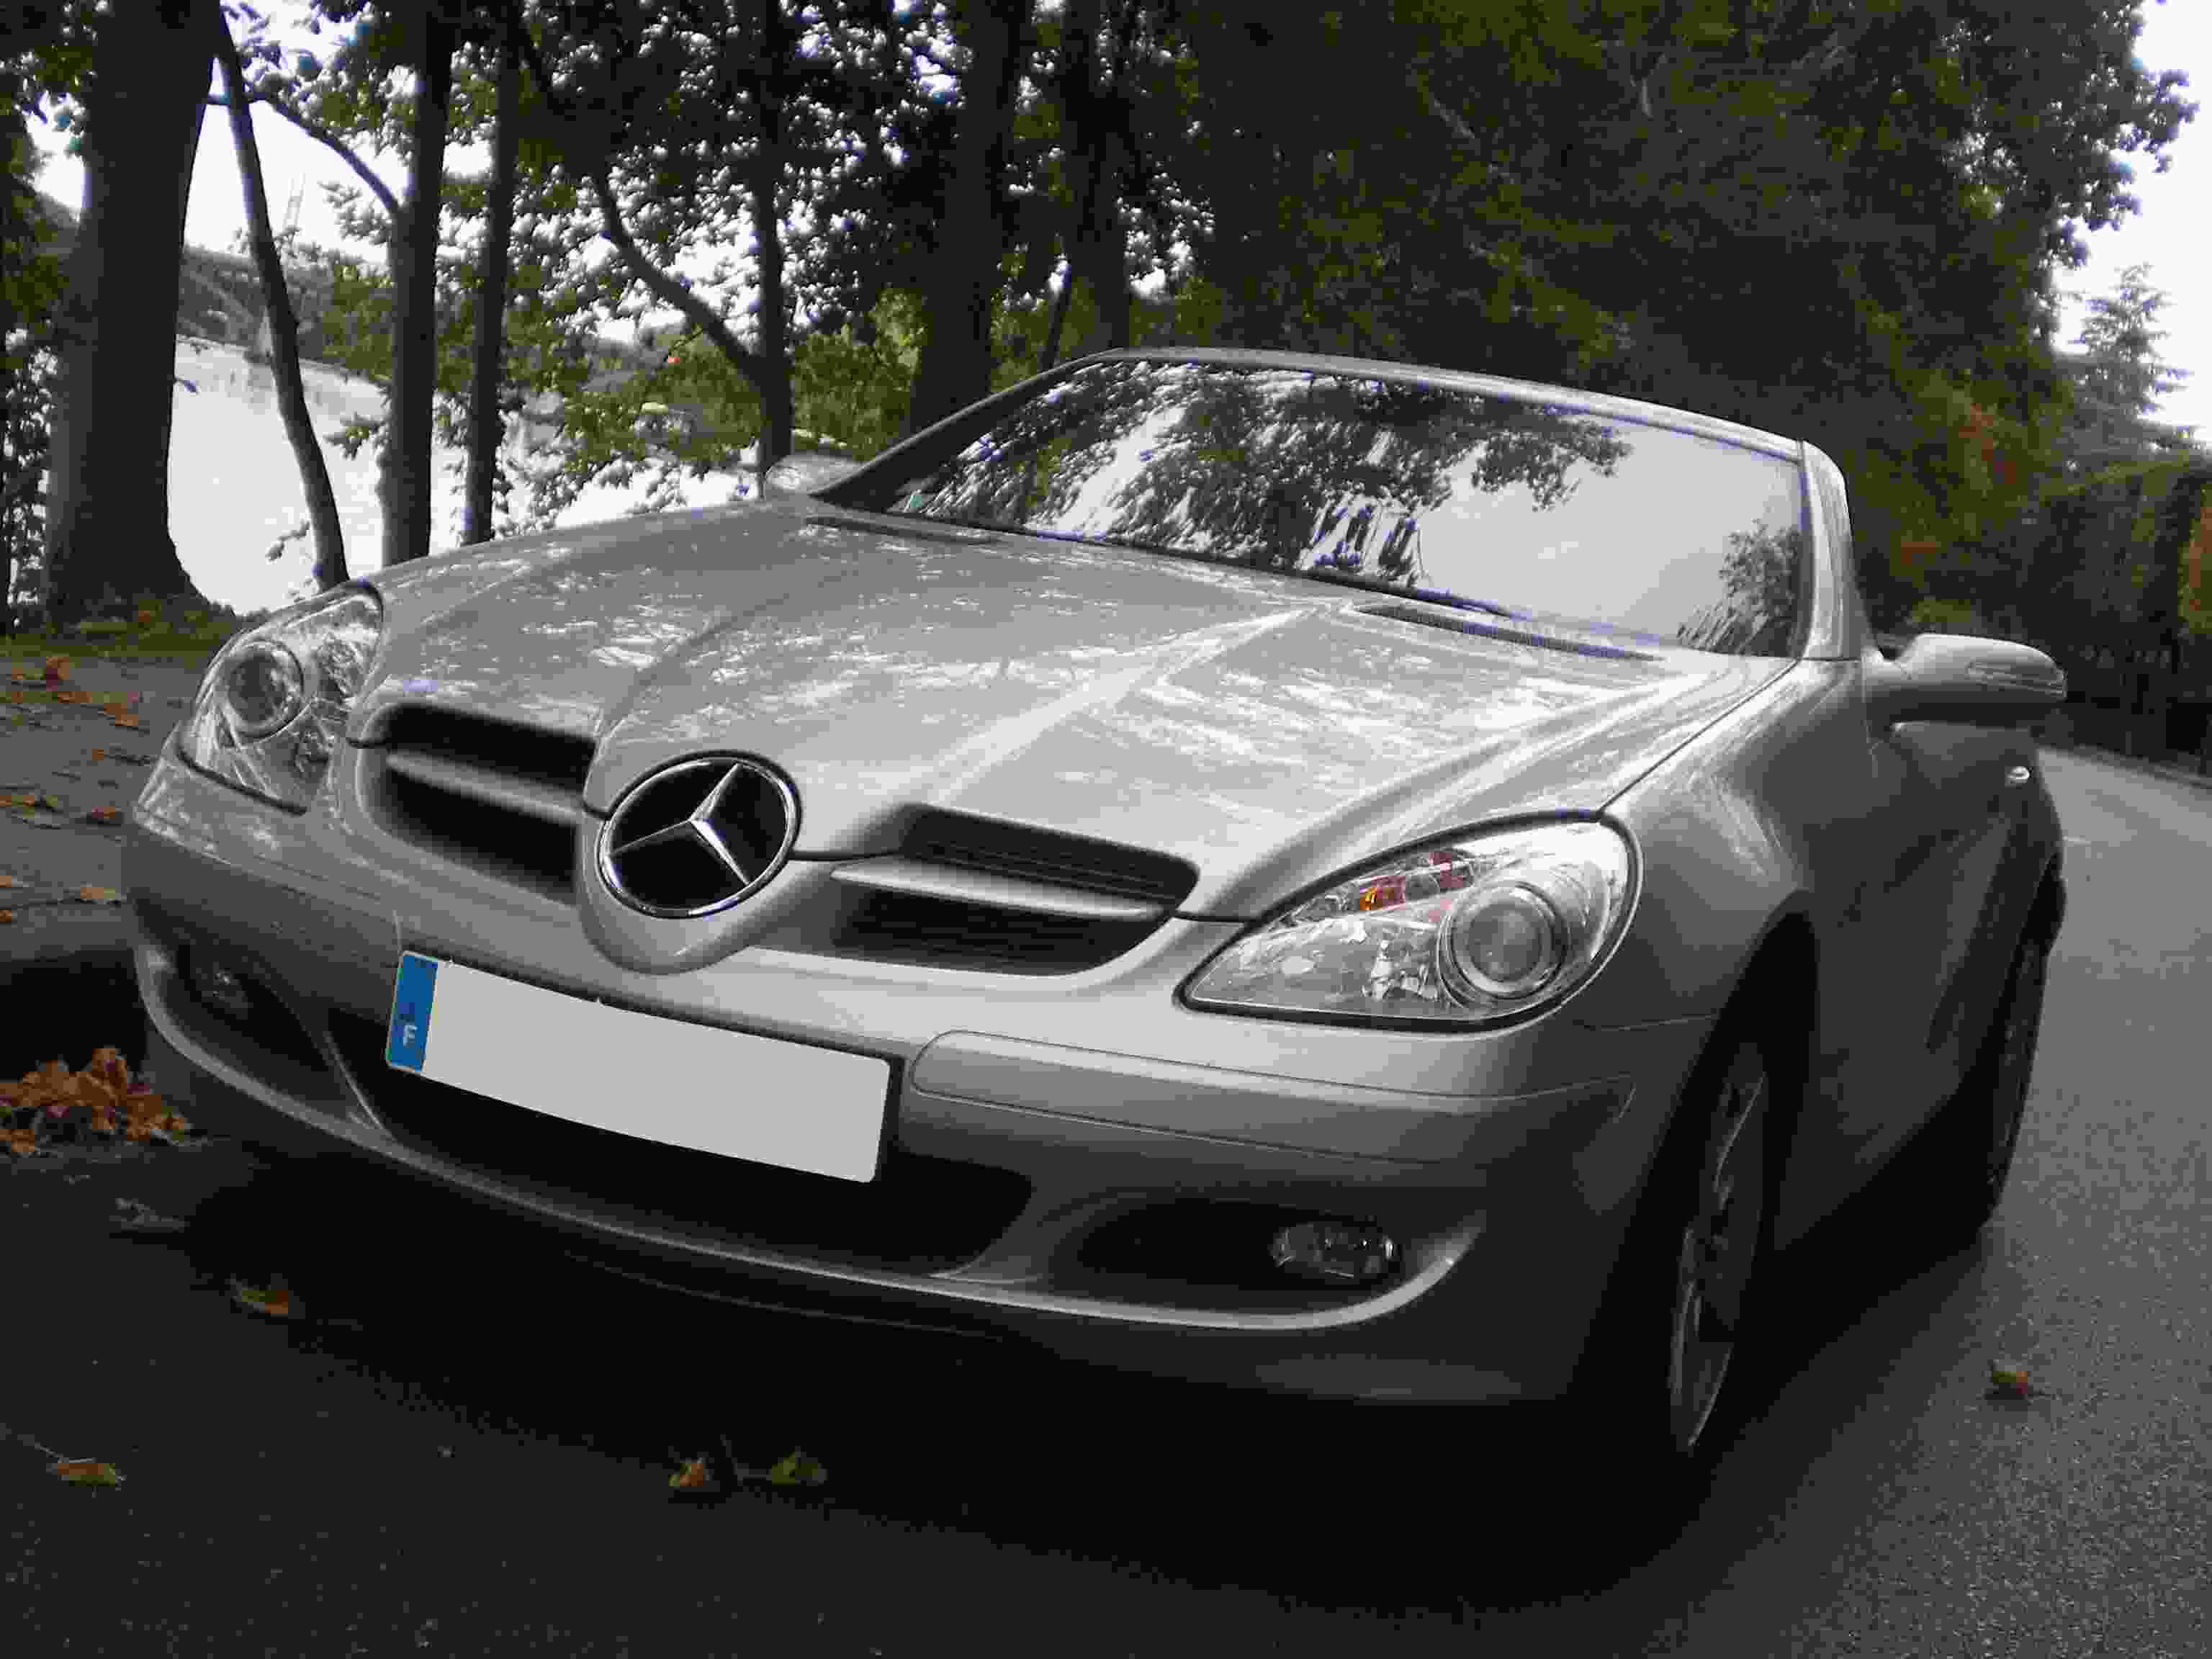 cabriolet 12000 euros